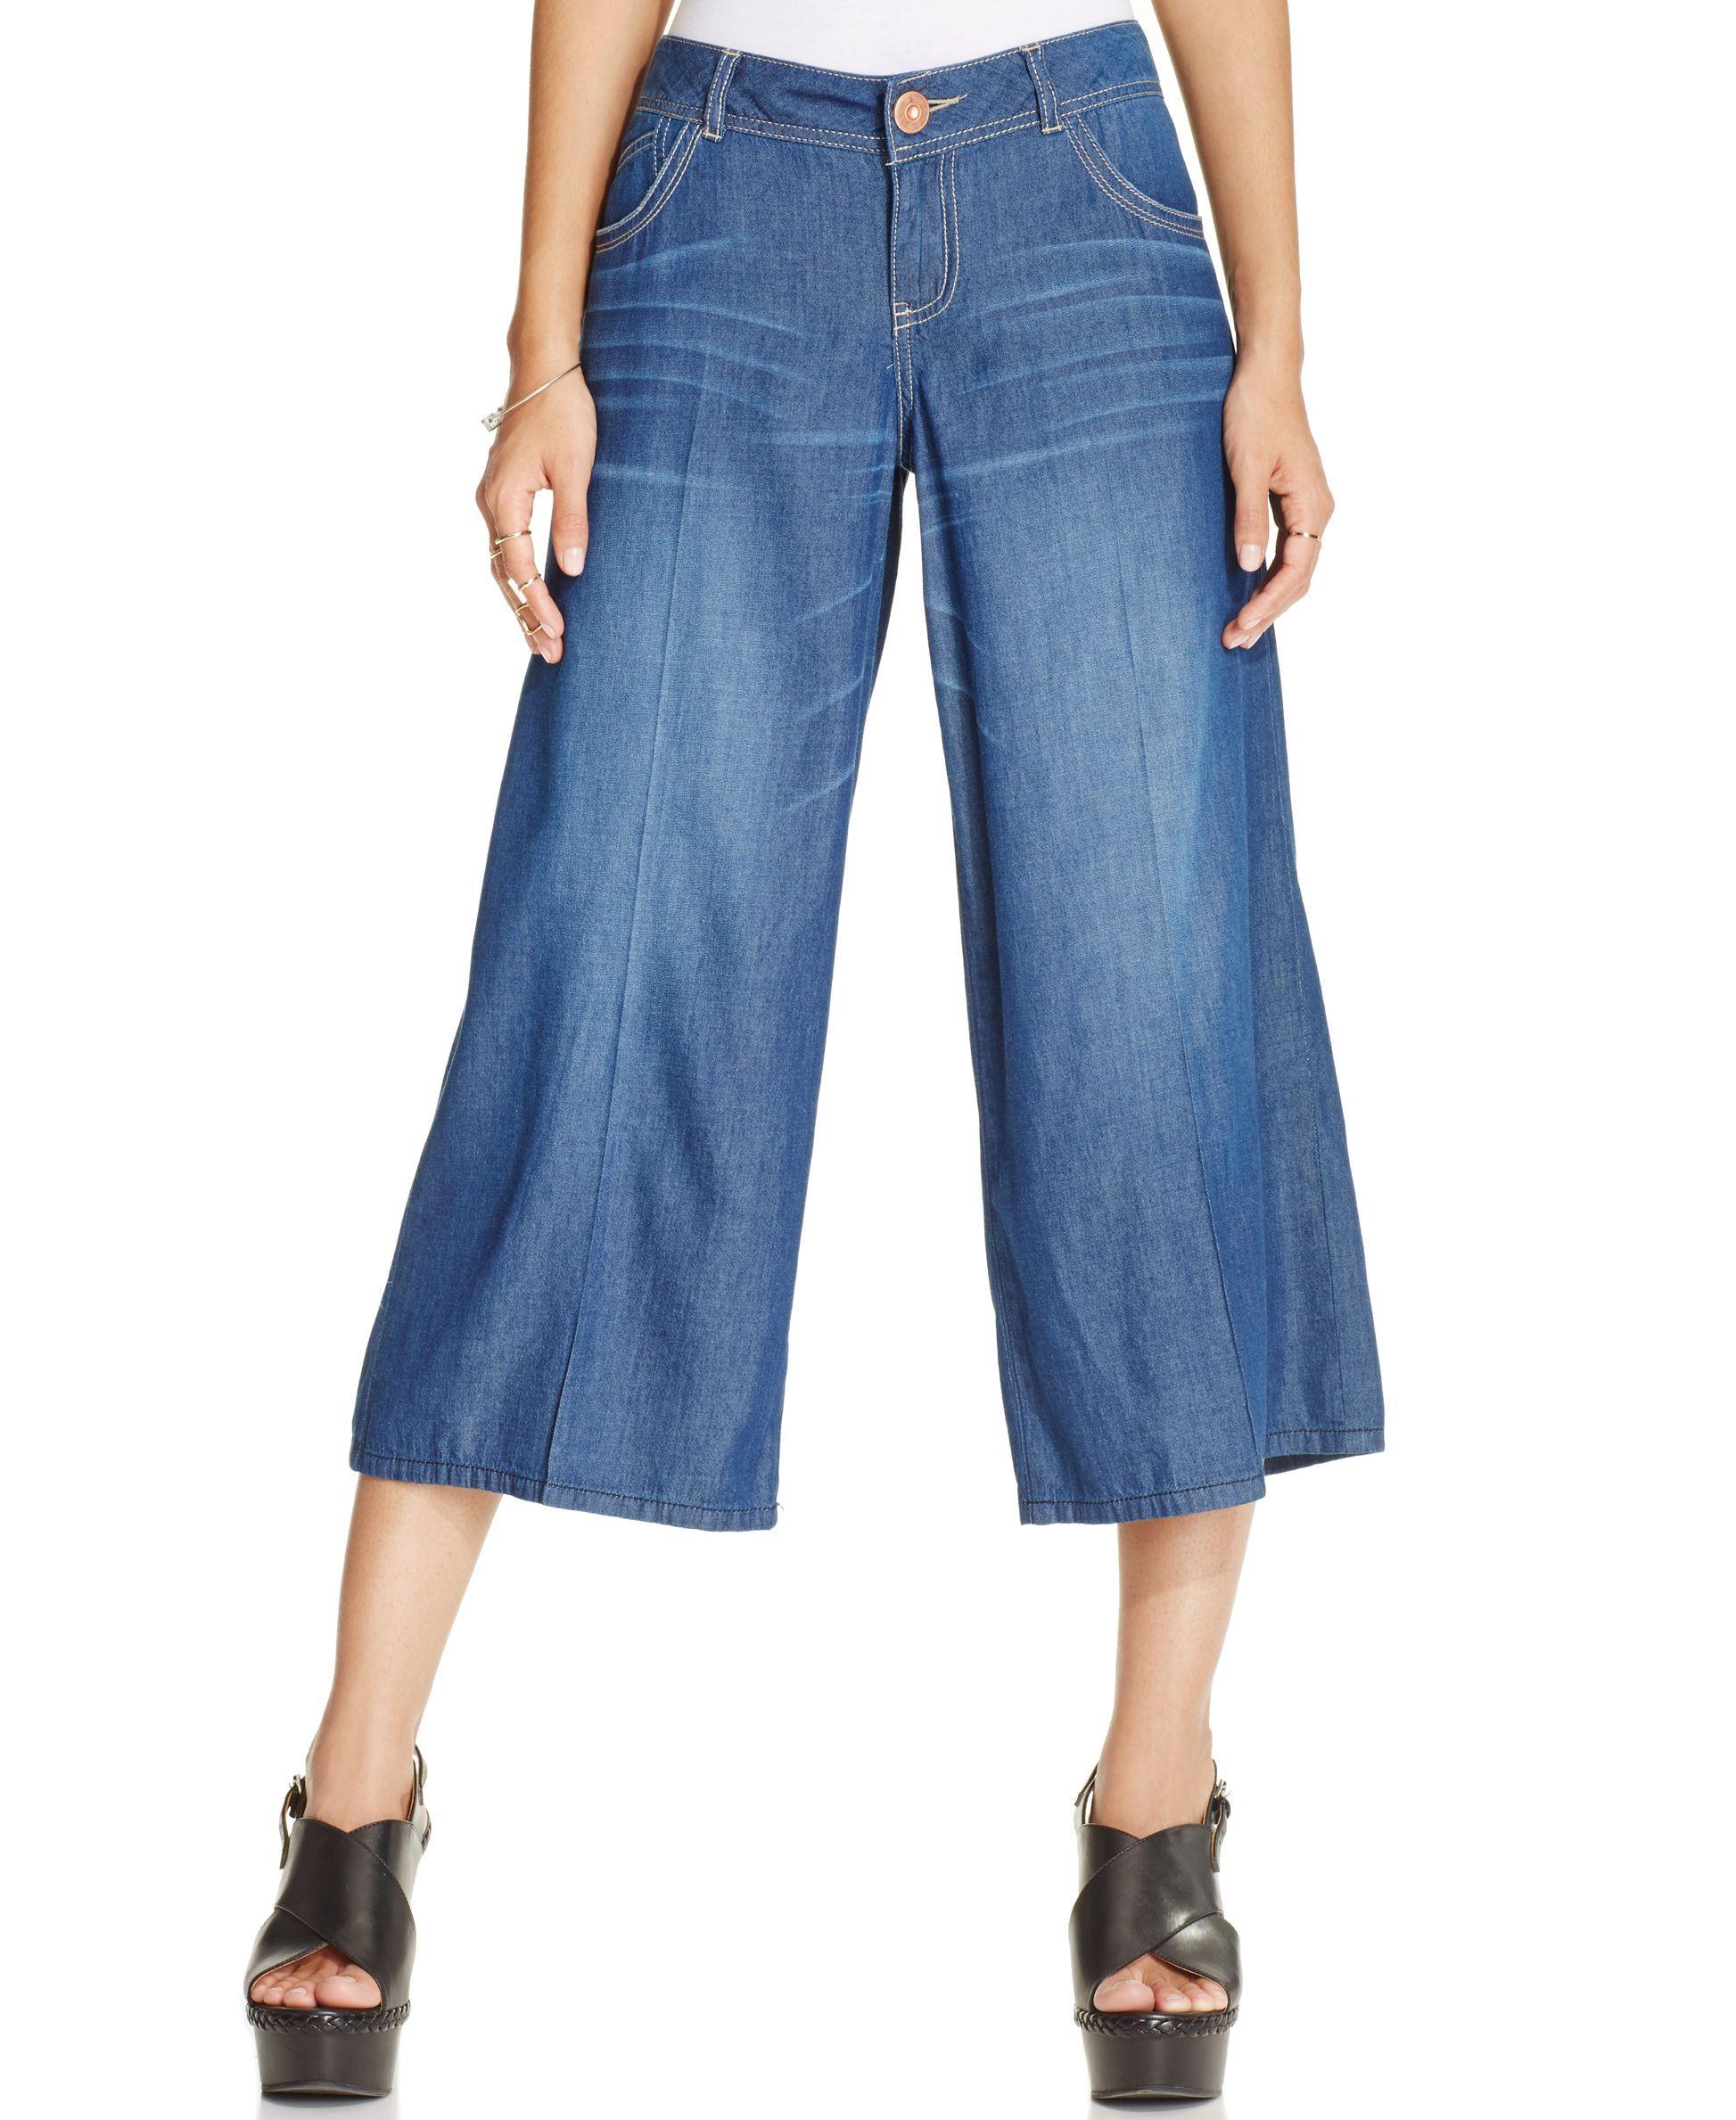 American Rag Denim Gaucho Pants | Products in 2019 | Denim